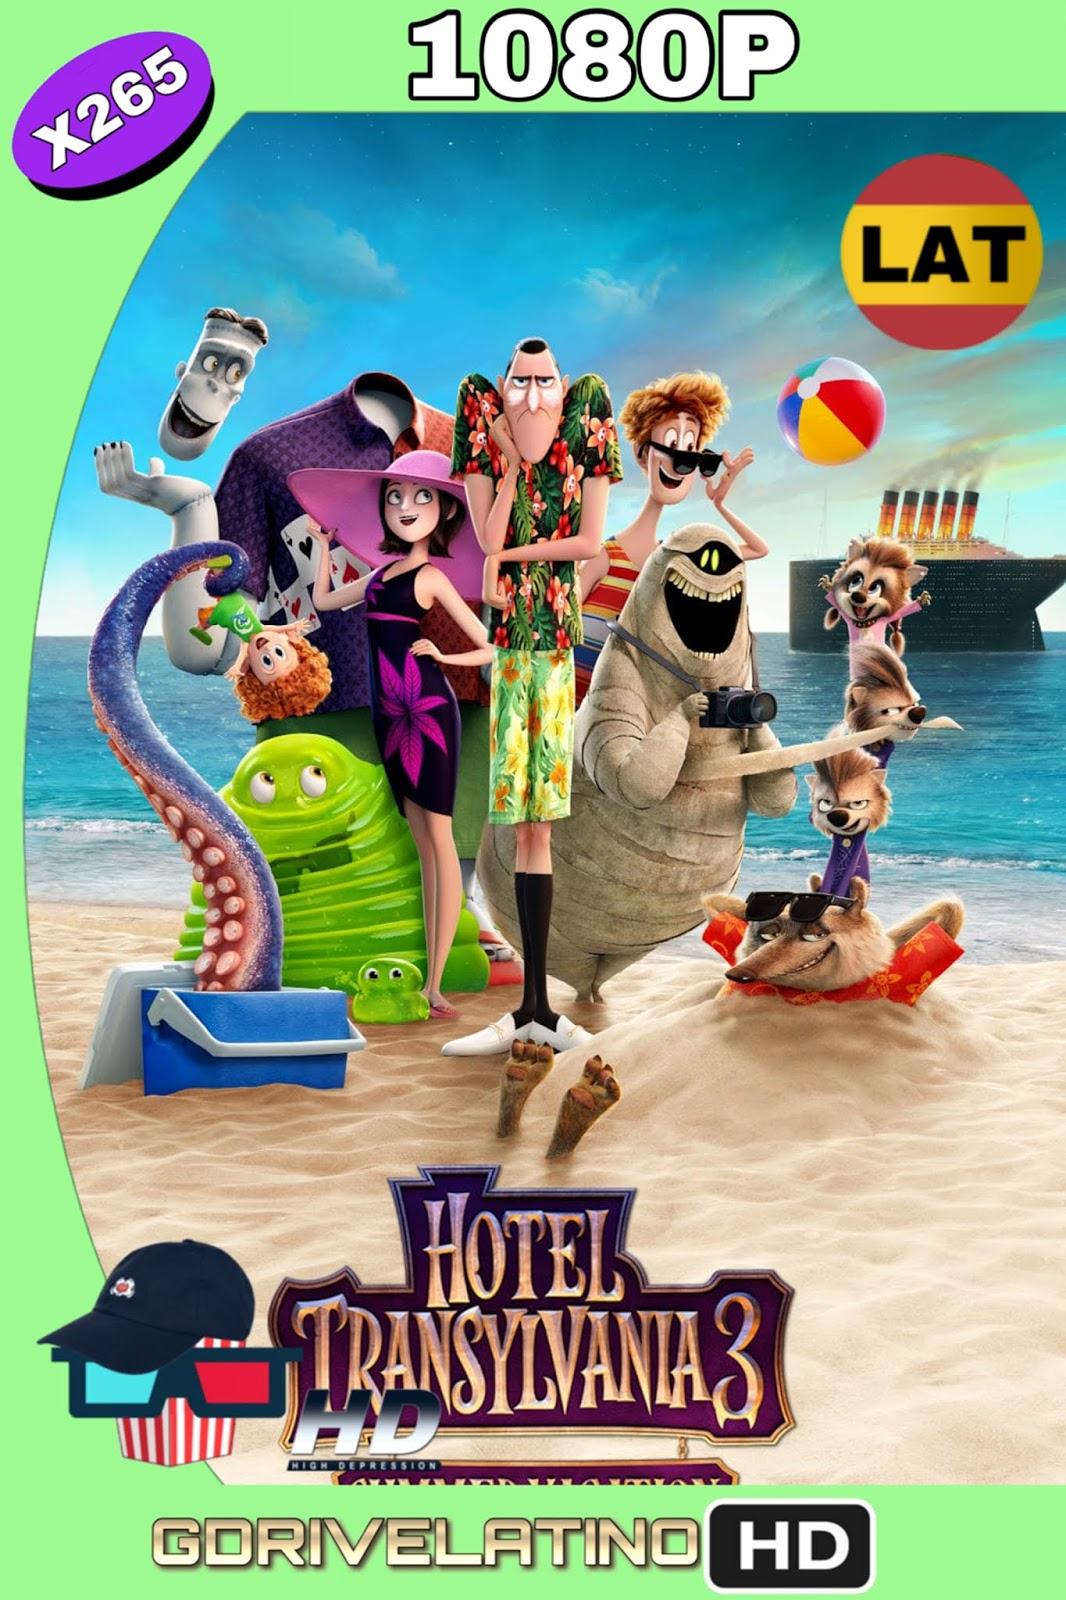 Hotel Transylvania 3: Monstruos de vacaciones (2018) BDRip FULL 1080p ( HEVC x265) (Latino-Inglés) MKV